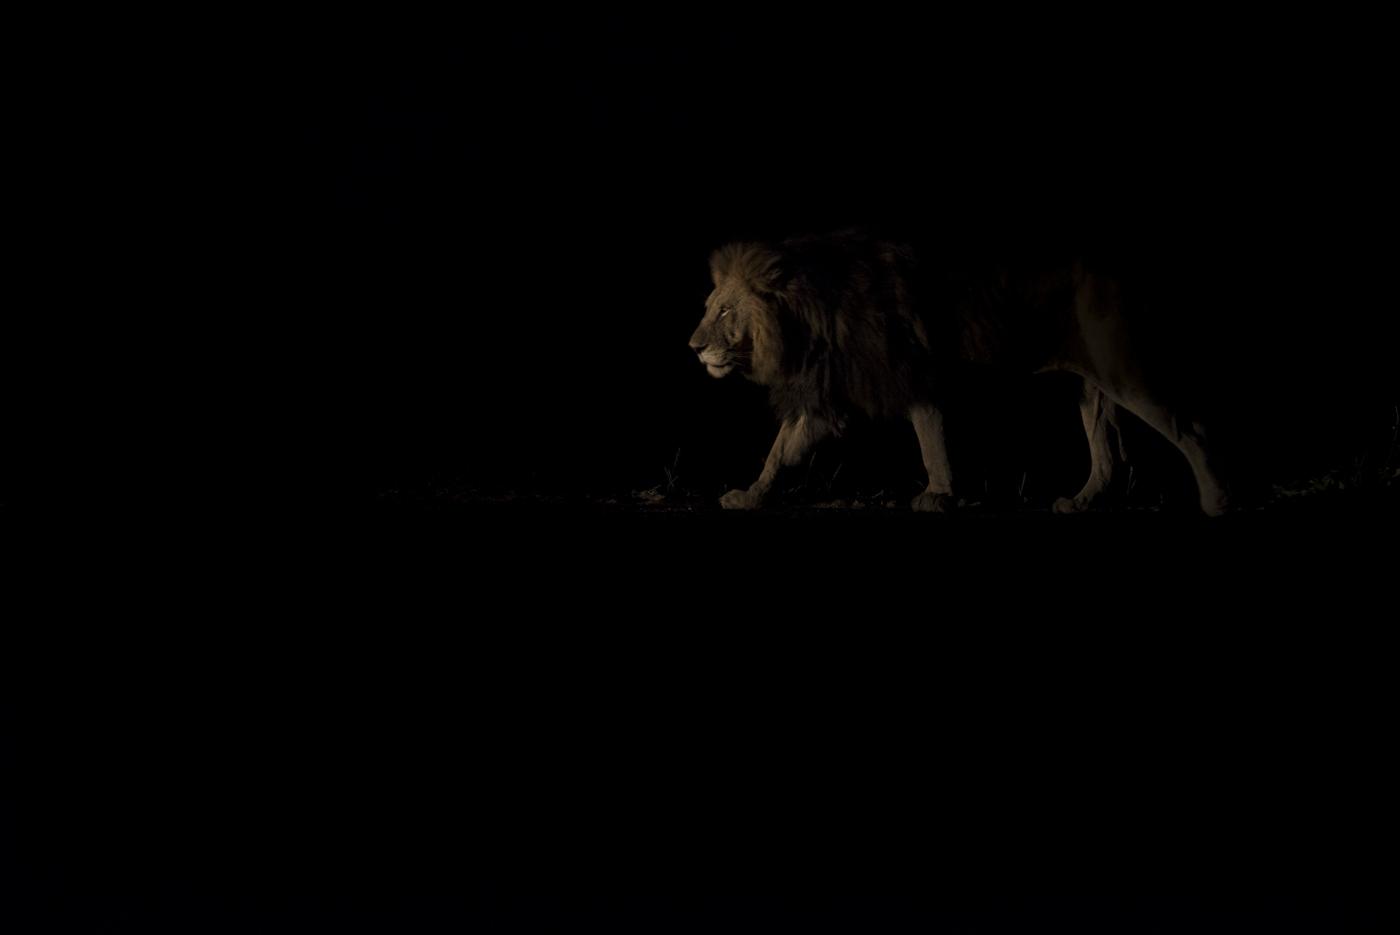 male lion backlight